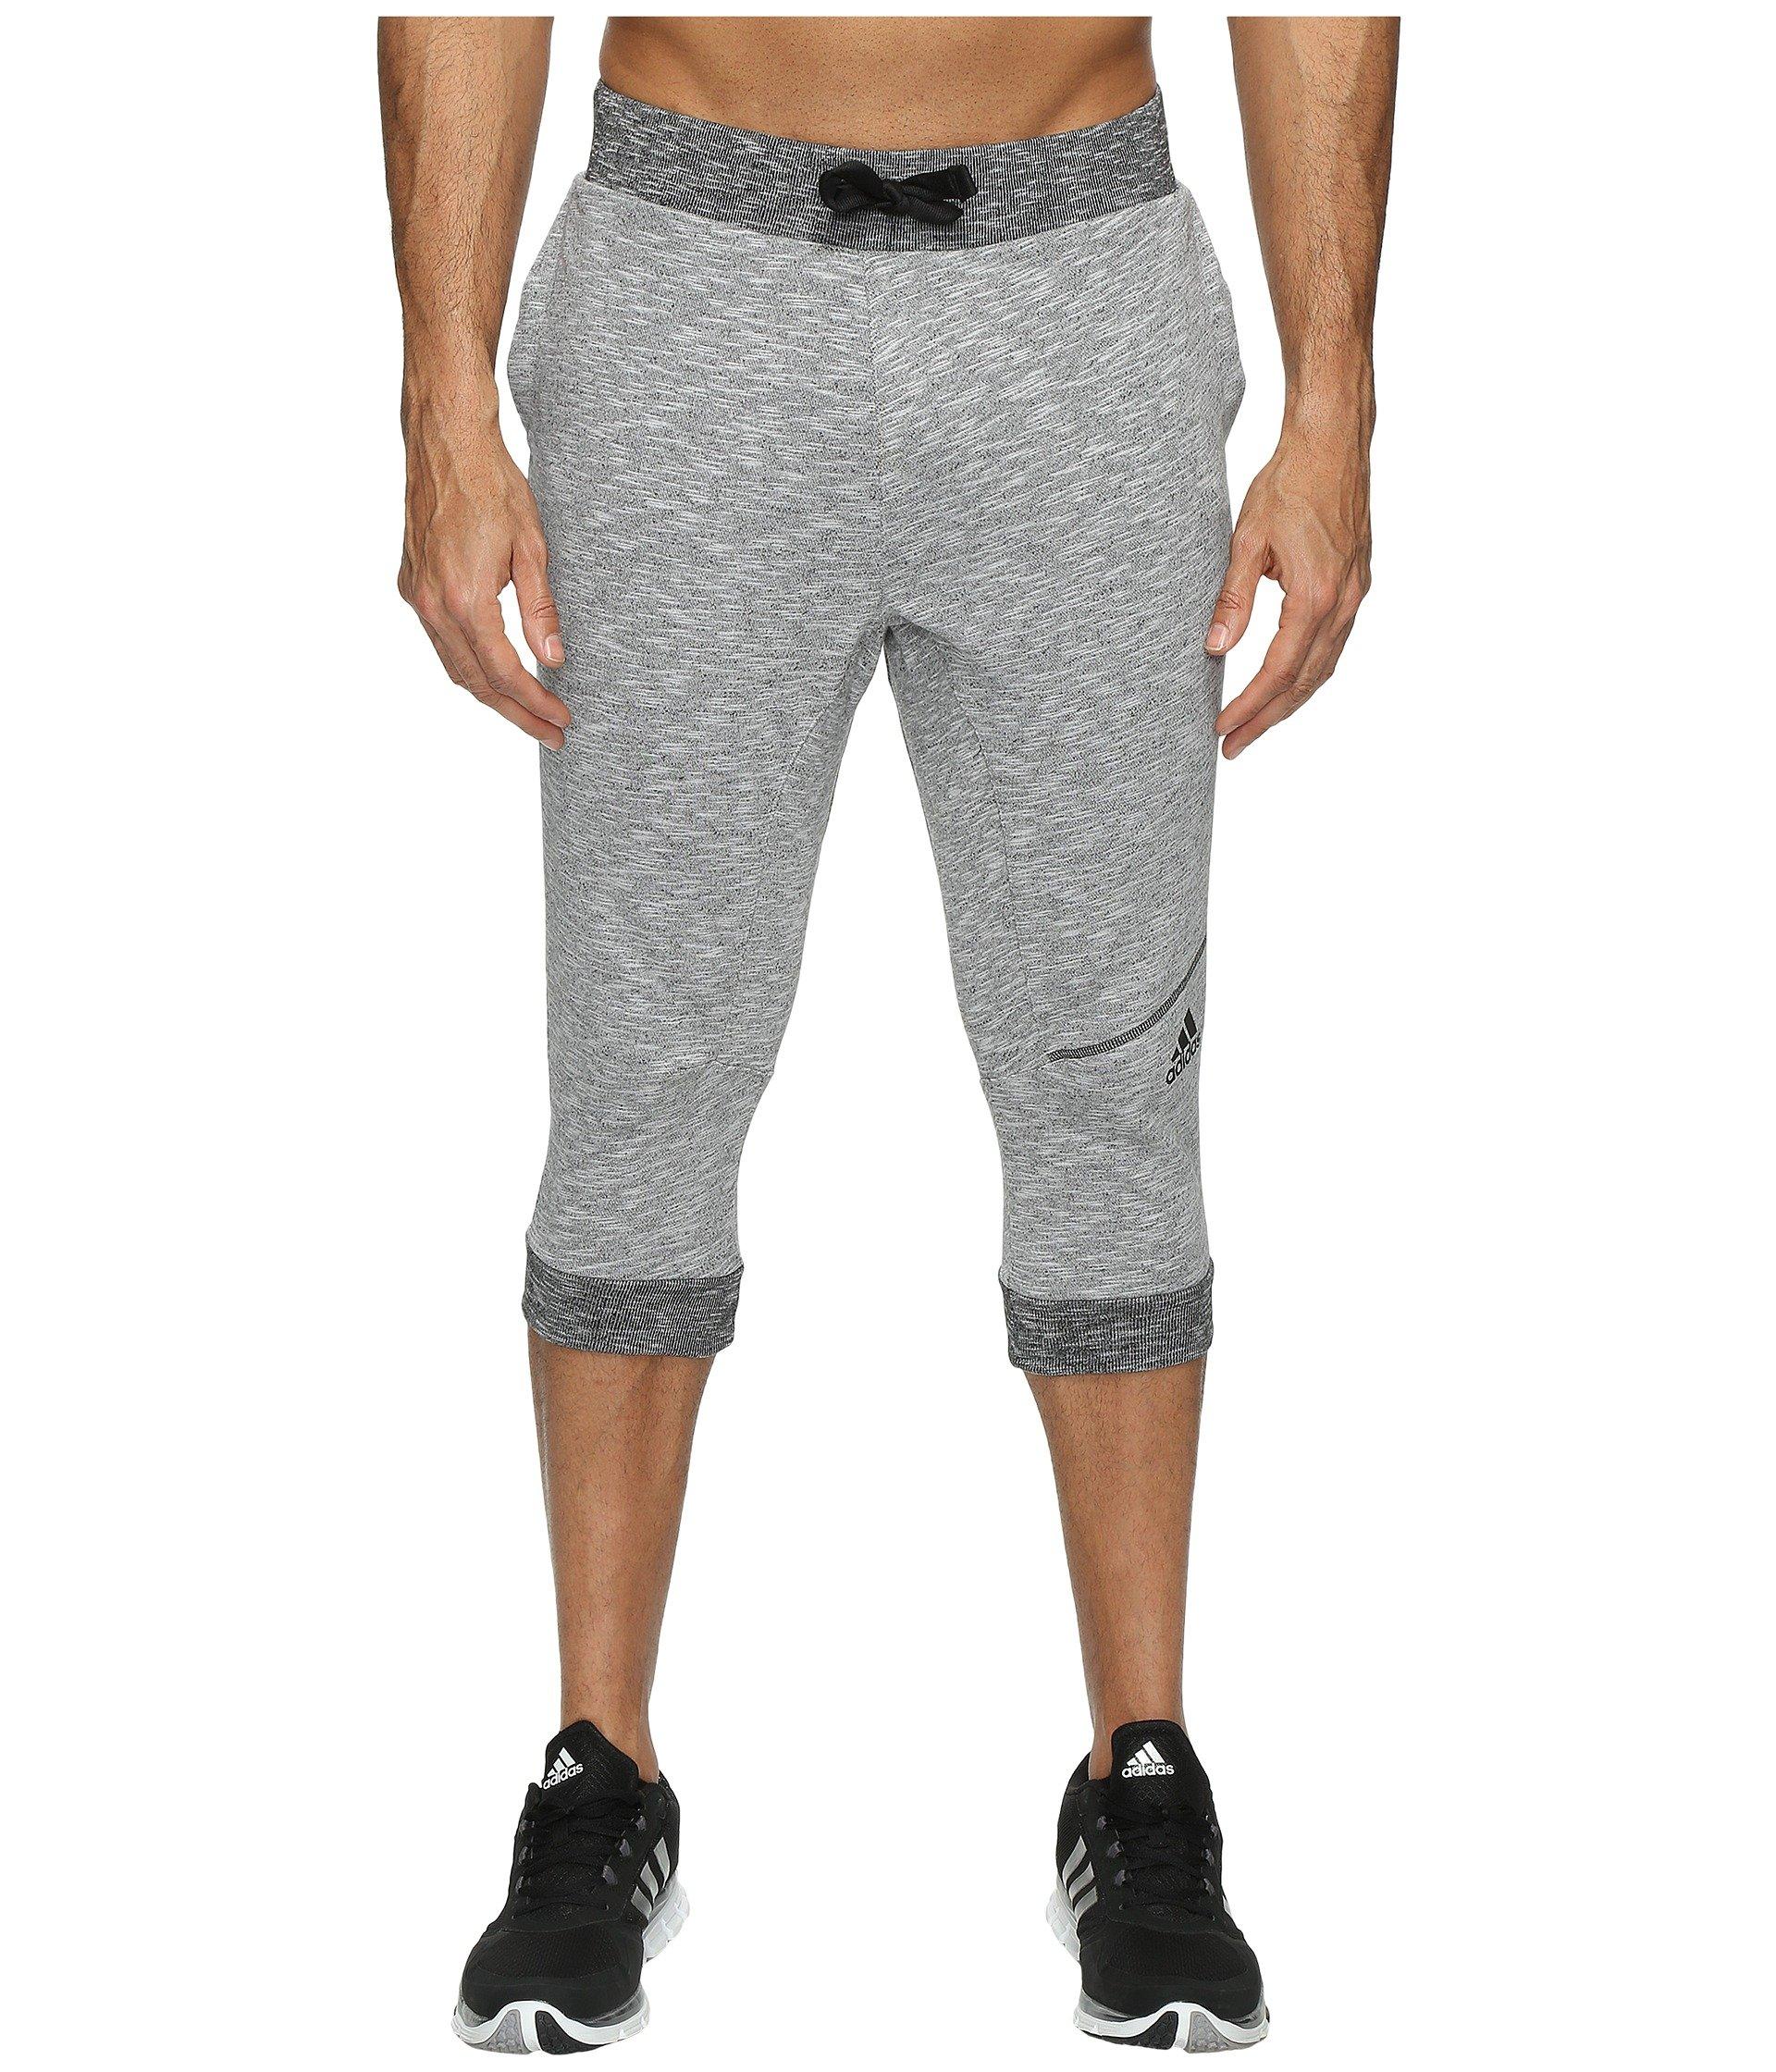 adidas Men's Basketball Cross Up 3/4 Pants, Light Grey Heather/Black, X-Large